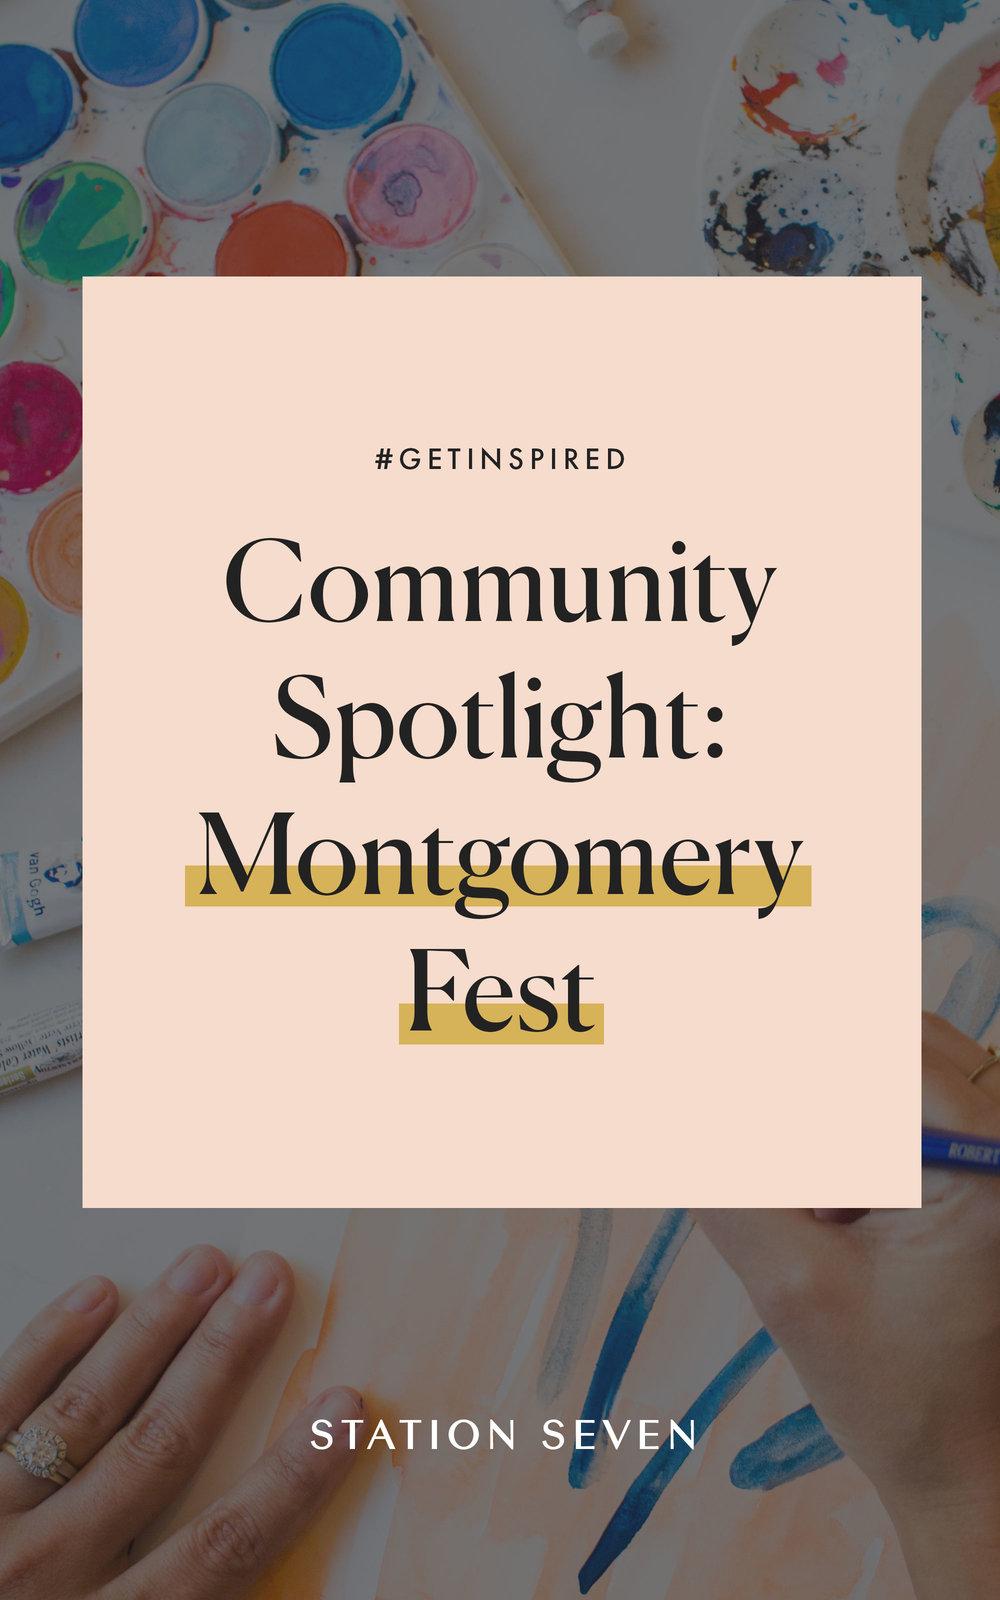 montgfestdisplay.png